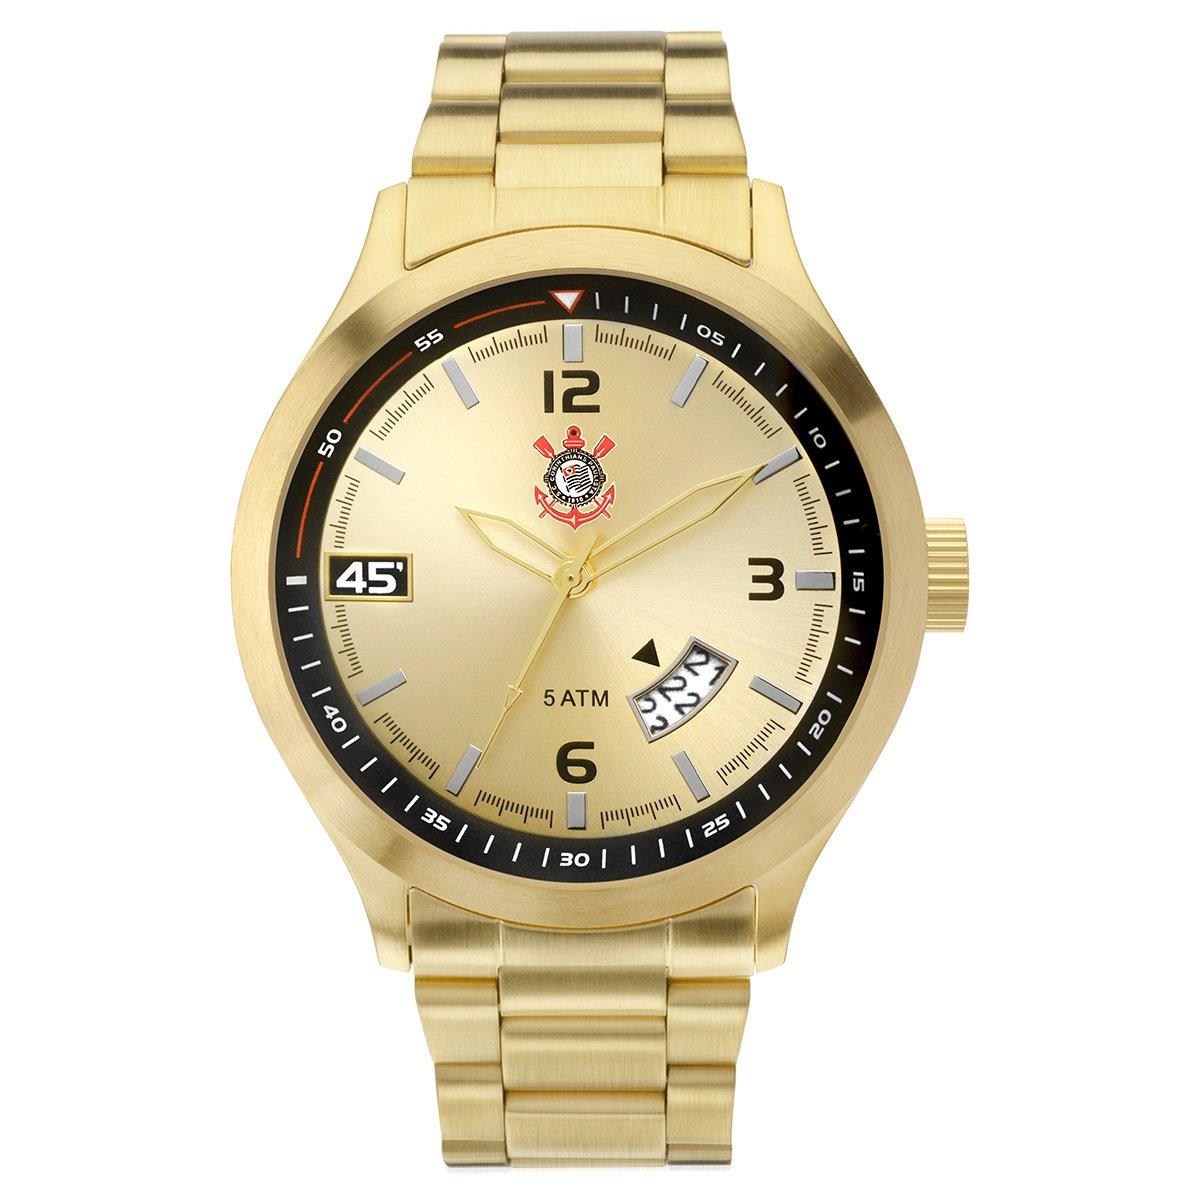 8f9699139716f Relógio Corinthians Technos Analógico Masculino - Compre Agora ...